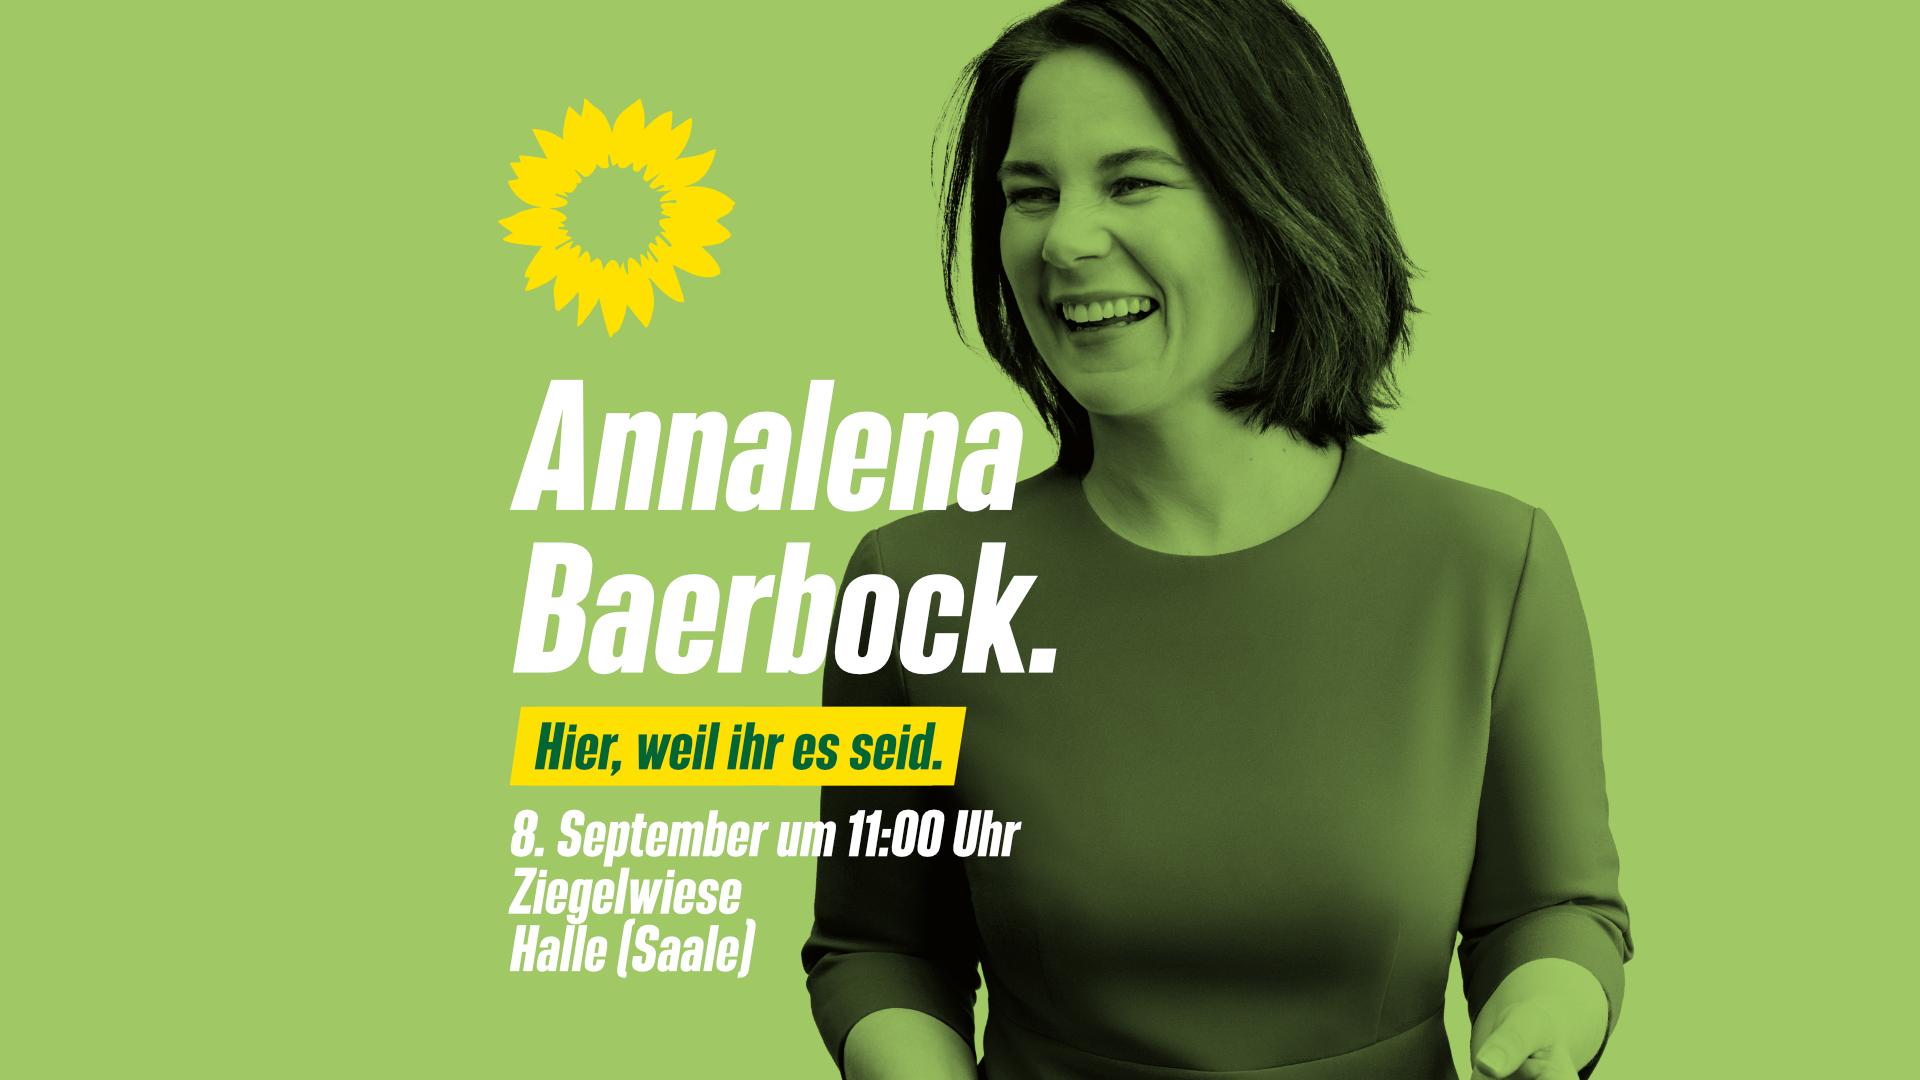 Annalena Baerbock in Halle